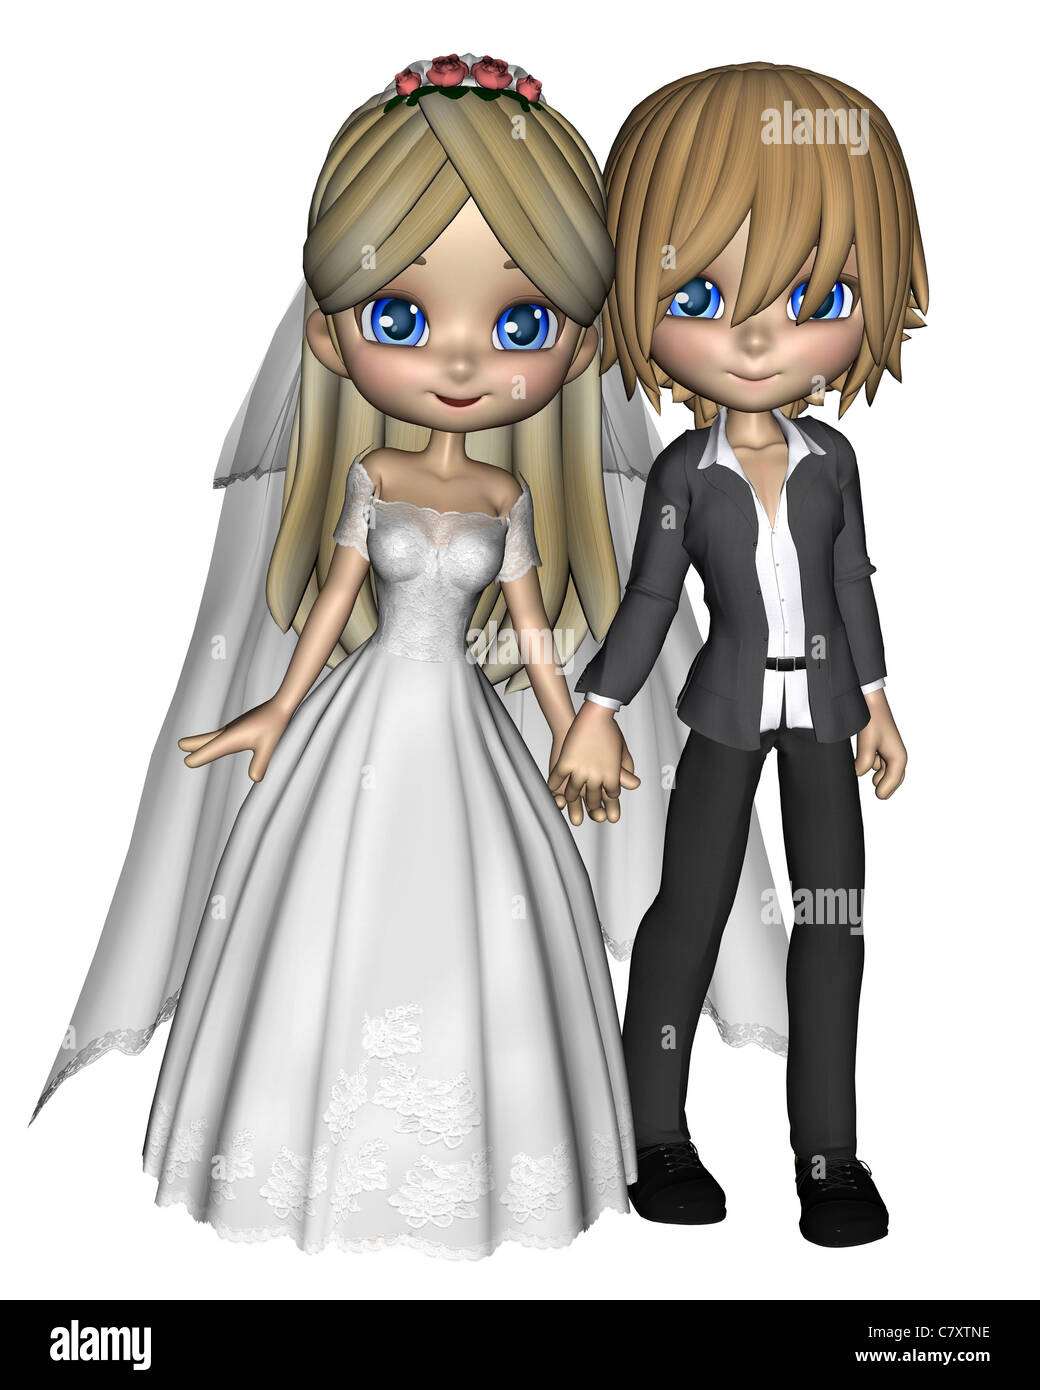 Cute Toon Wedding Couple - 1 - Stock Image